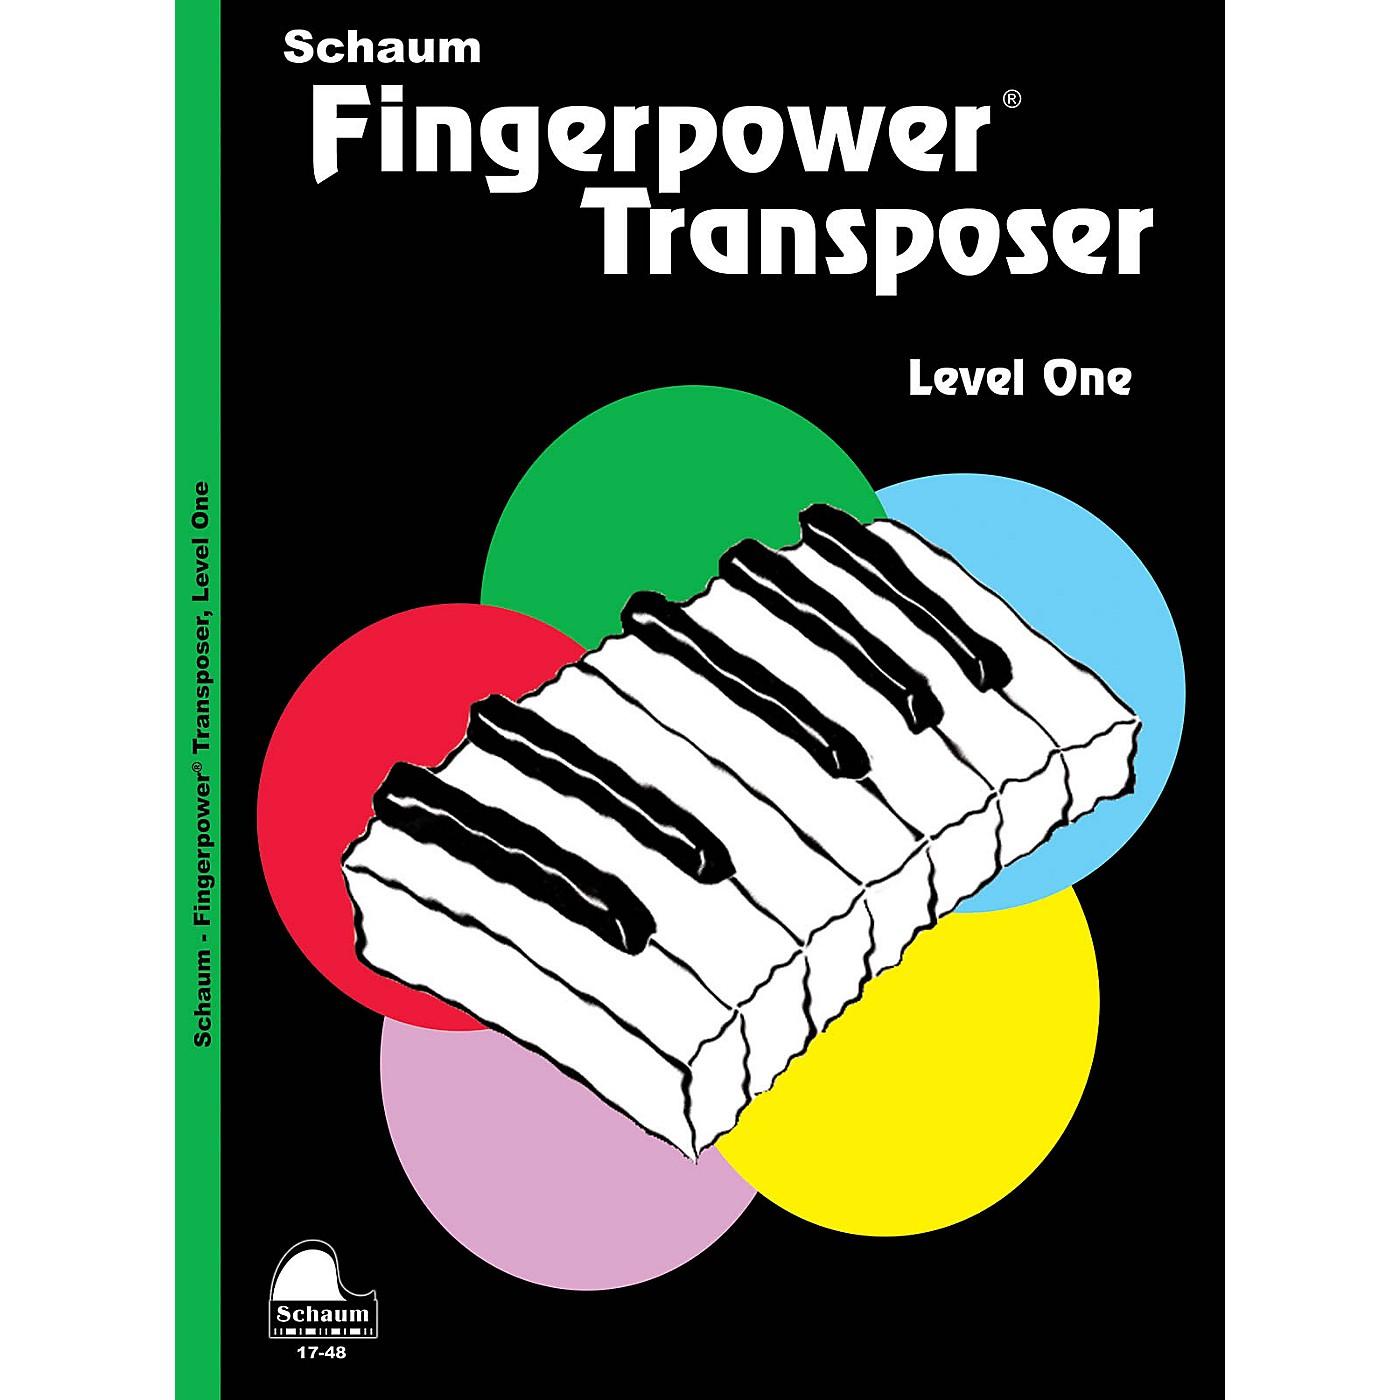 SCHAUM Fingerpower® Transposer (Level 1 Elem Level) Educational Piano Book by Wesley Schaum thumbnail